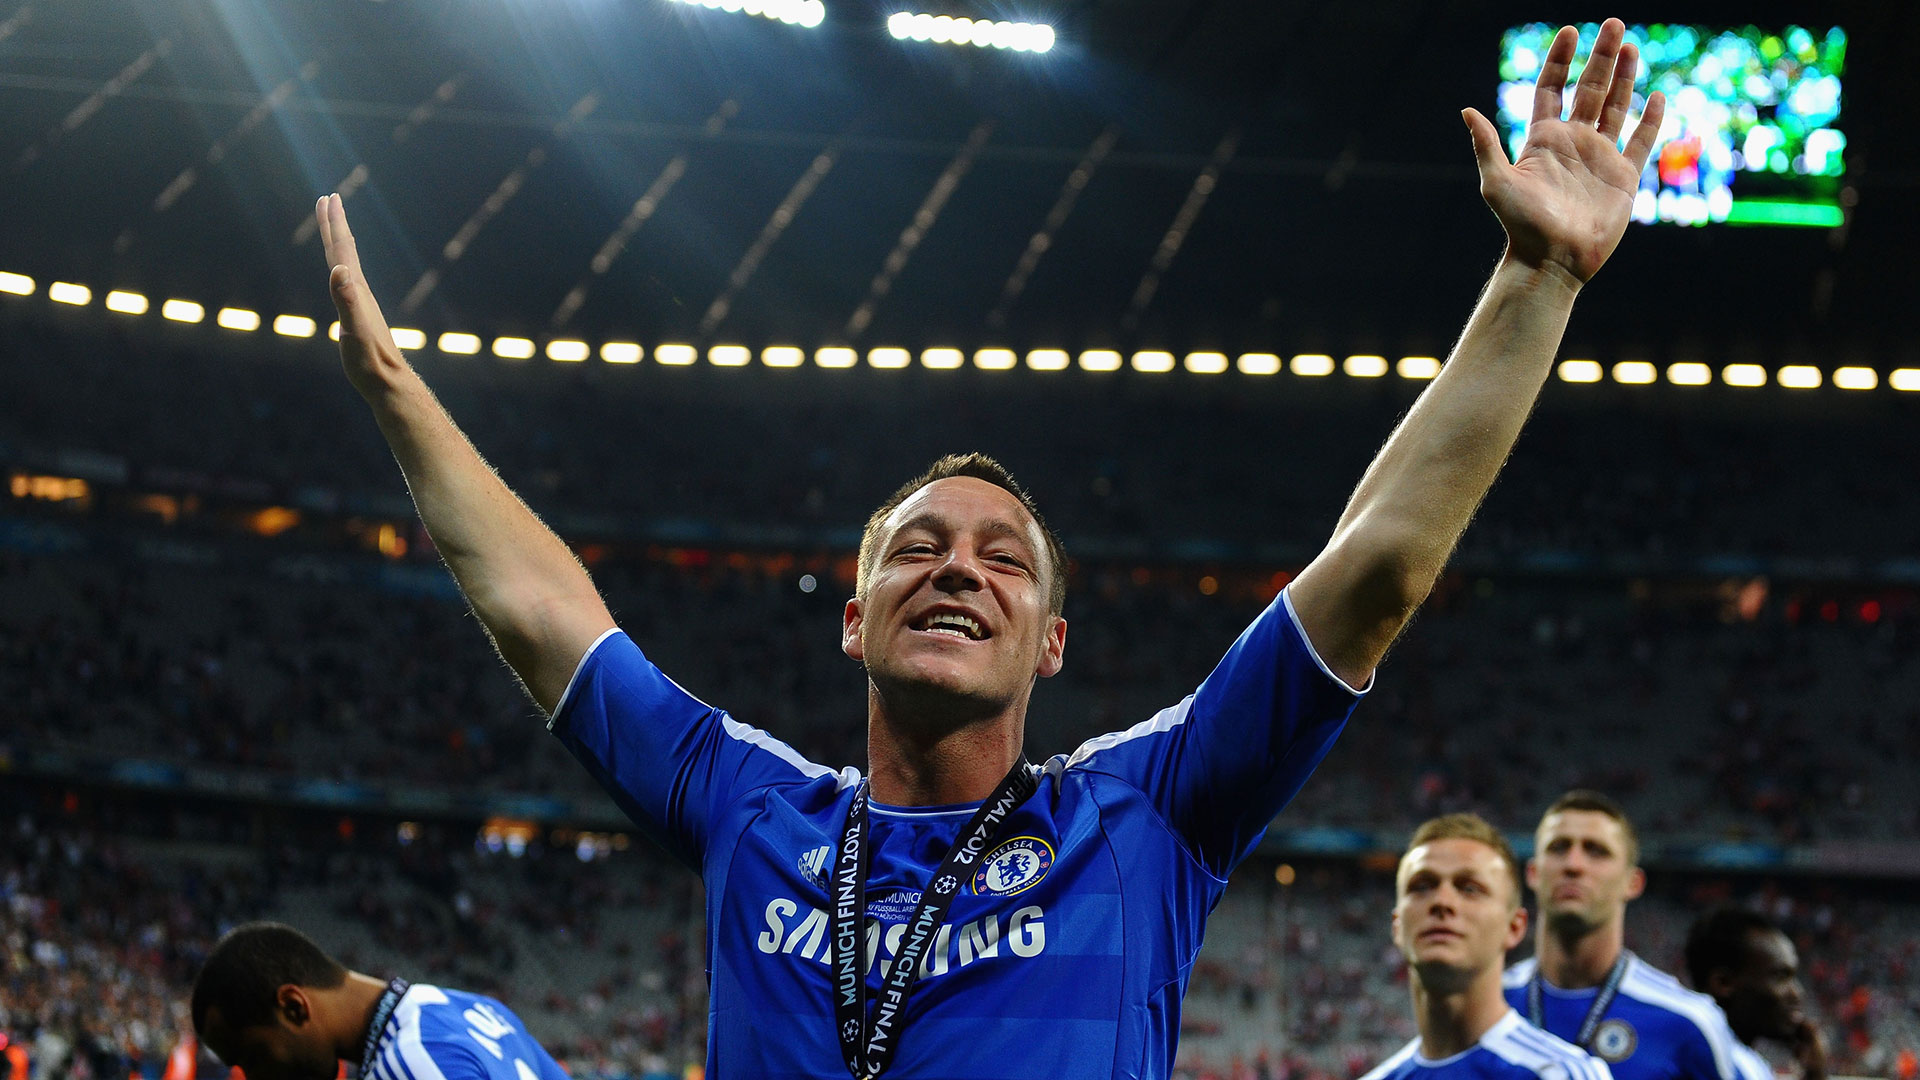 John Terry Chelsea Champions League 2012